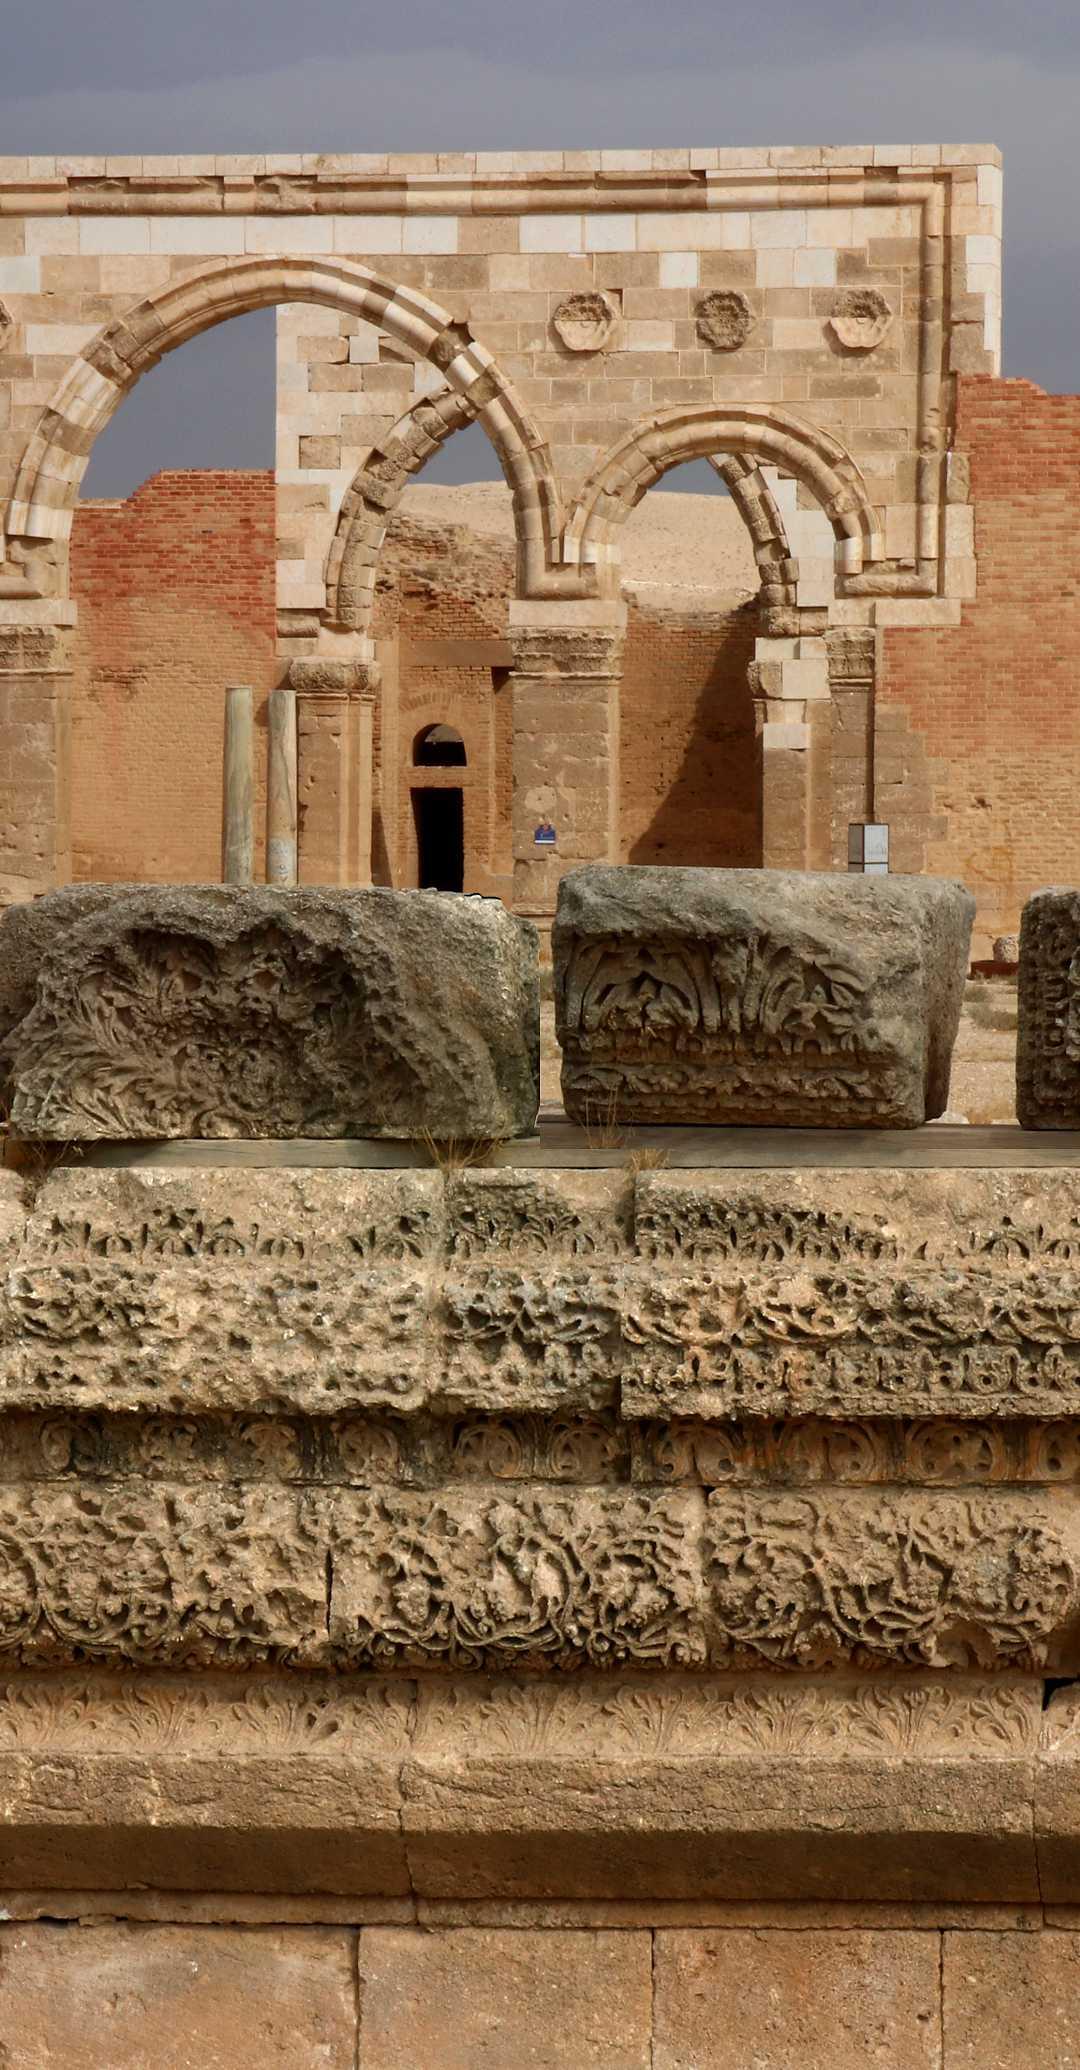 Mschatta Palast in Jordanien